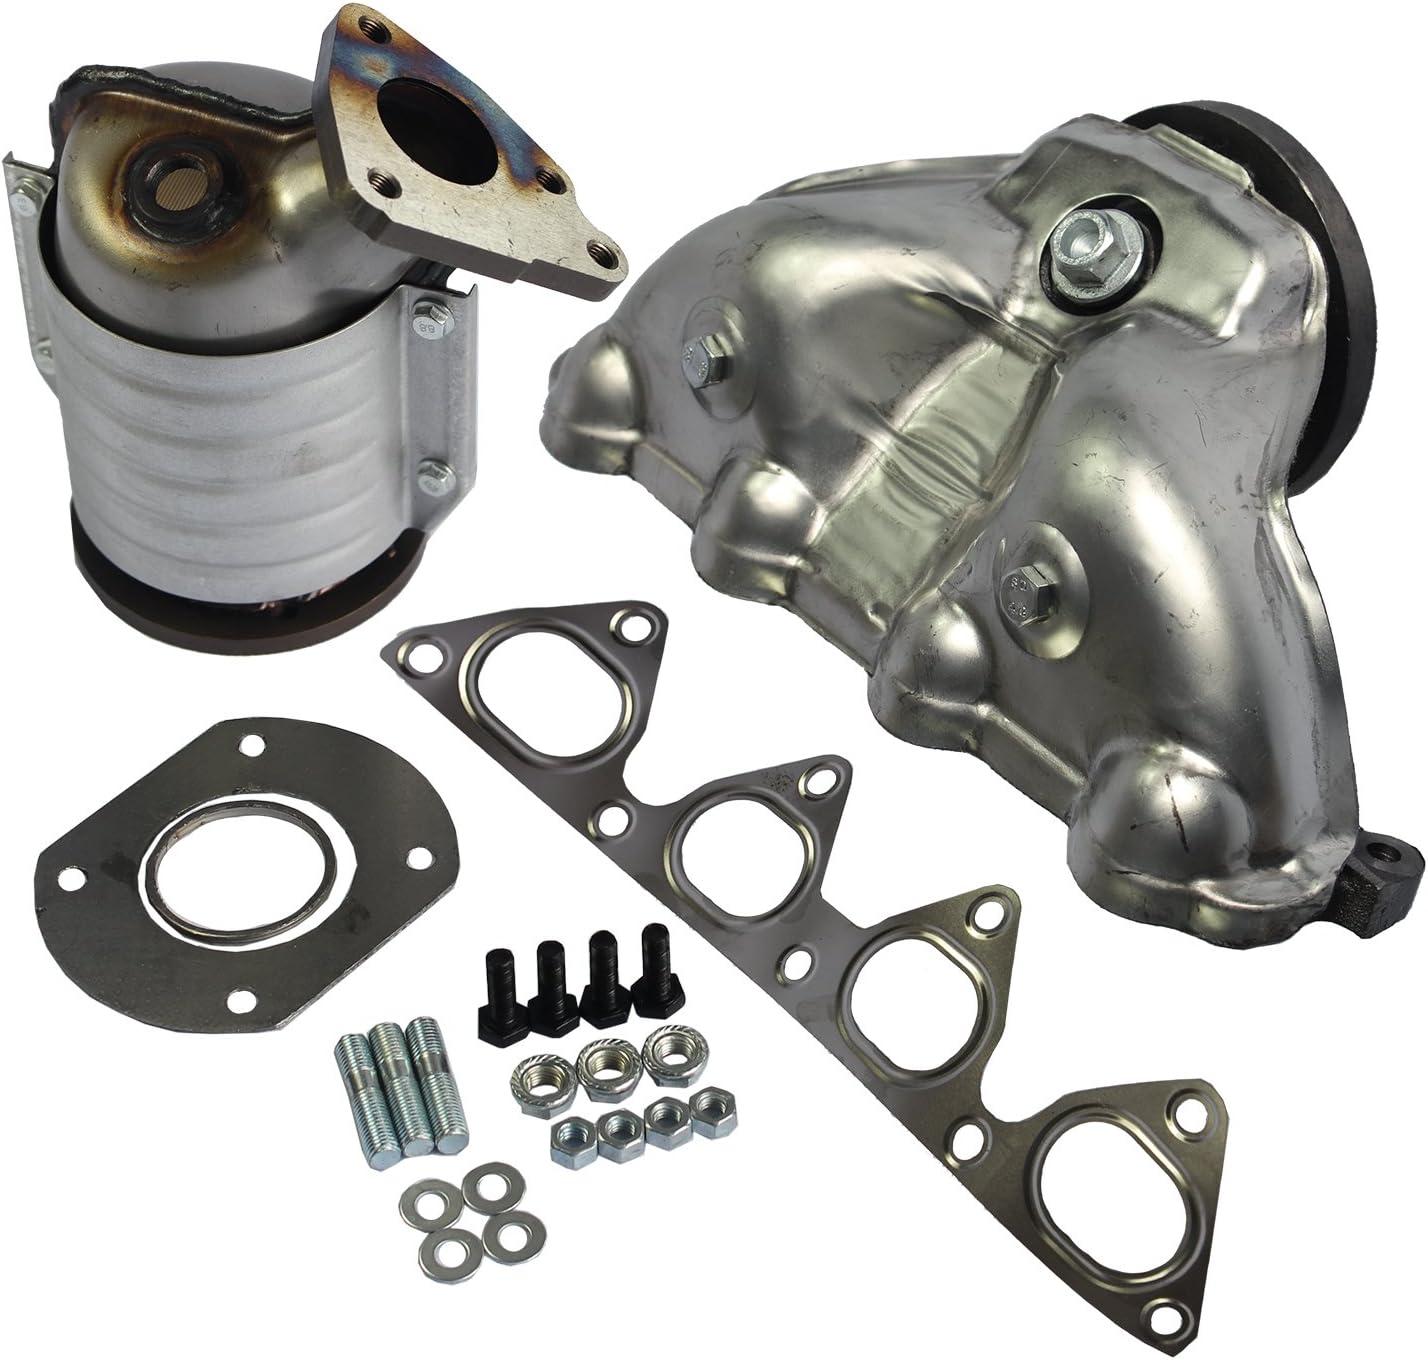 JDMSPEED New Exhaust Manifold 674-439 現品 Honda Civi Replacement For 国産品